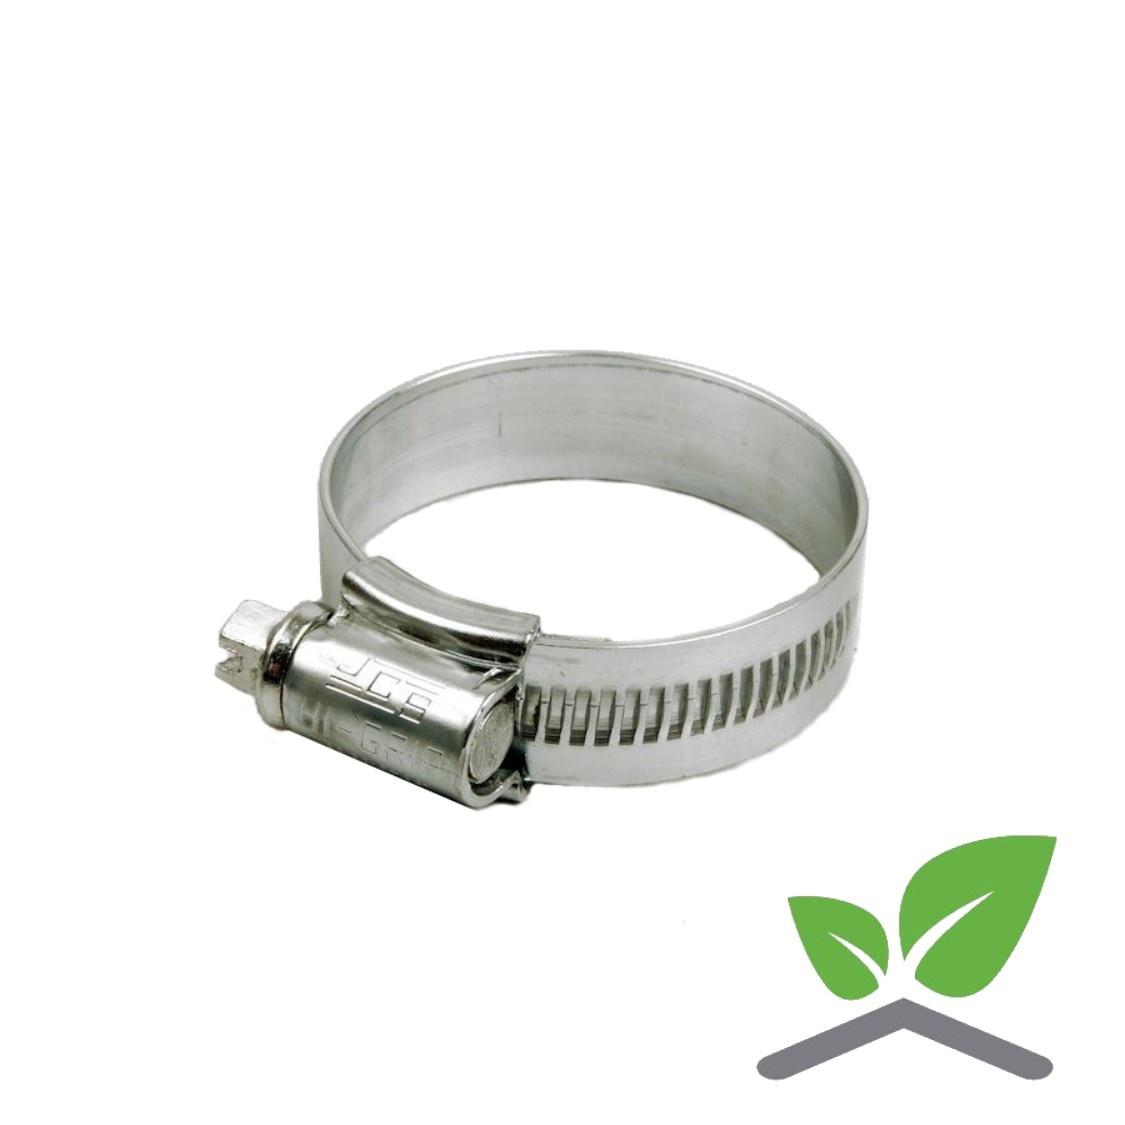 JCS HI-GRIP HOSE CLIP Stainless Steel 35-45mm